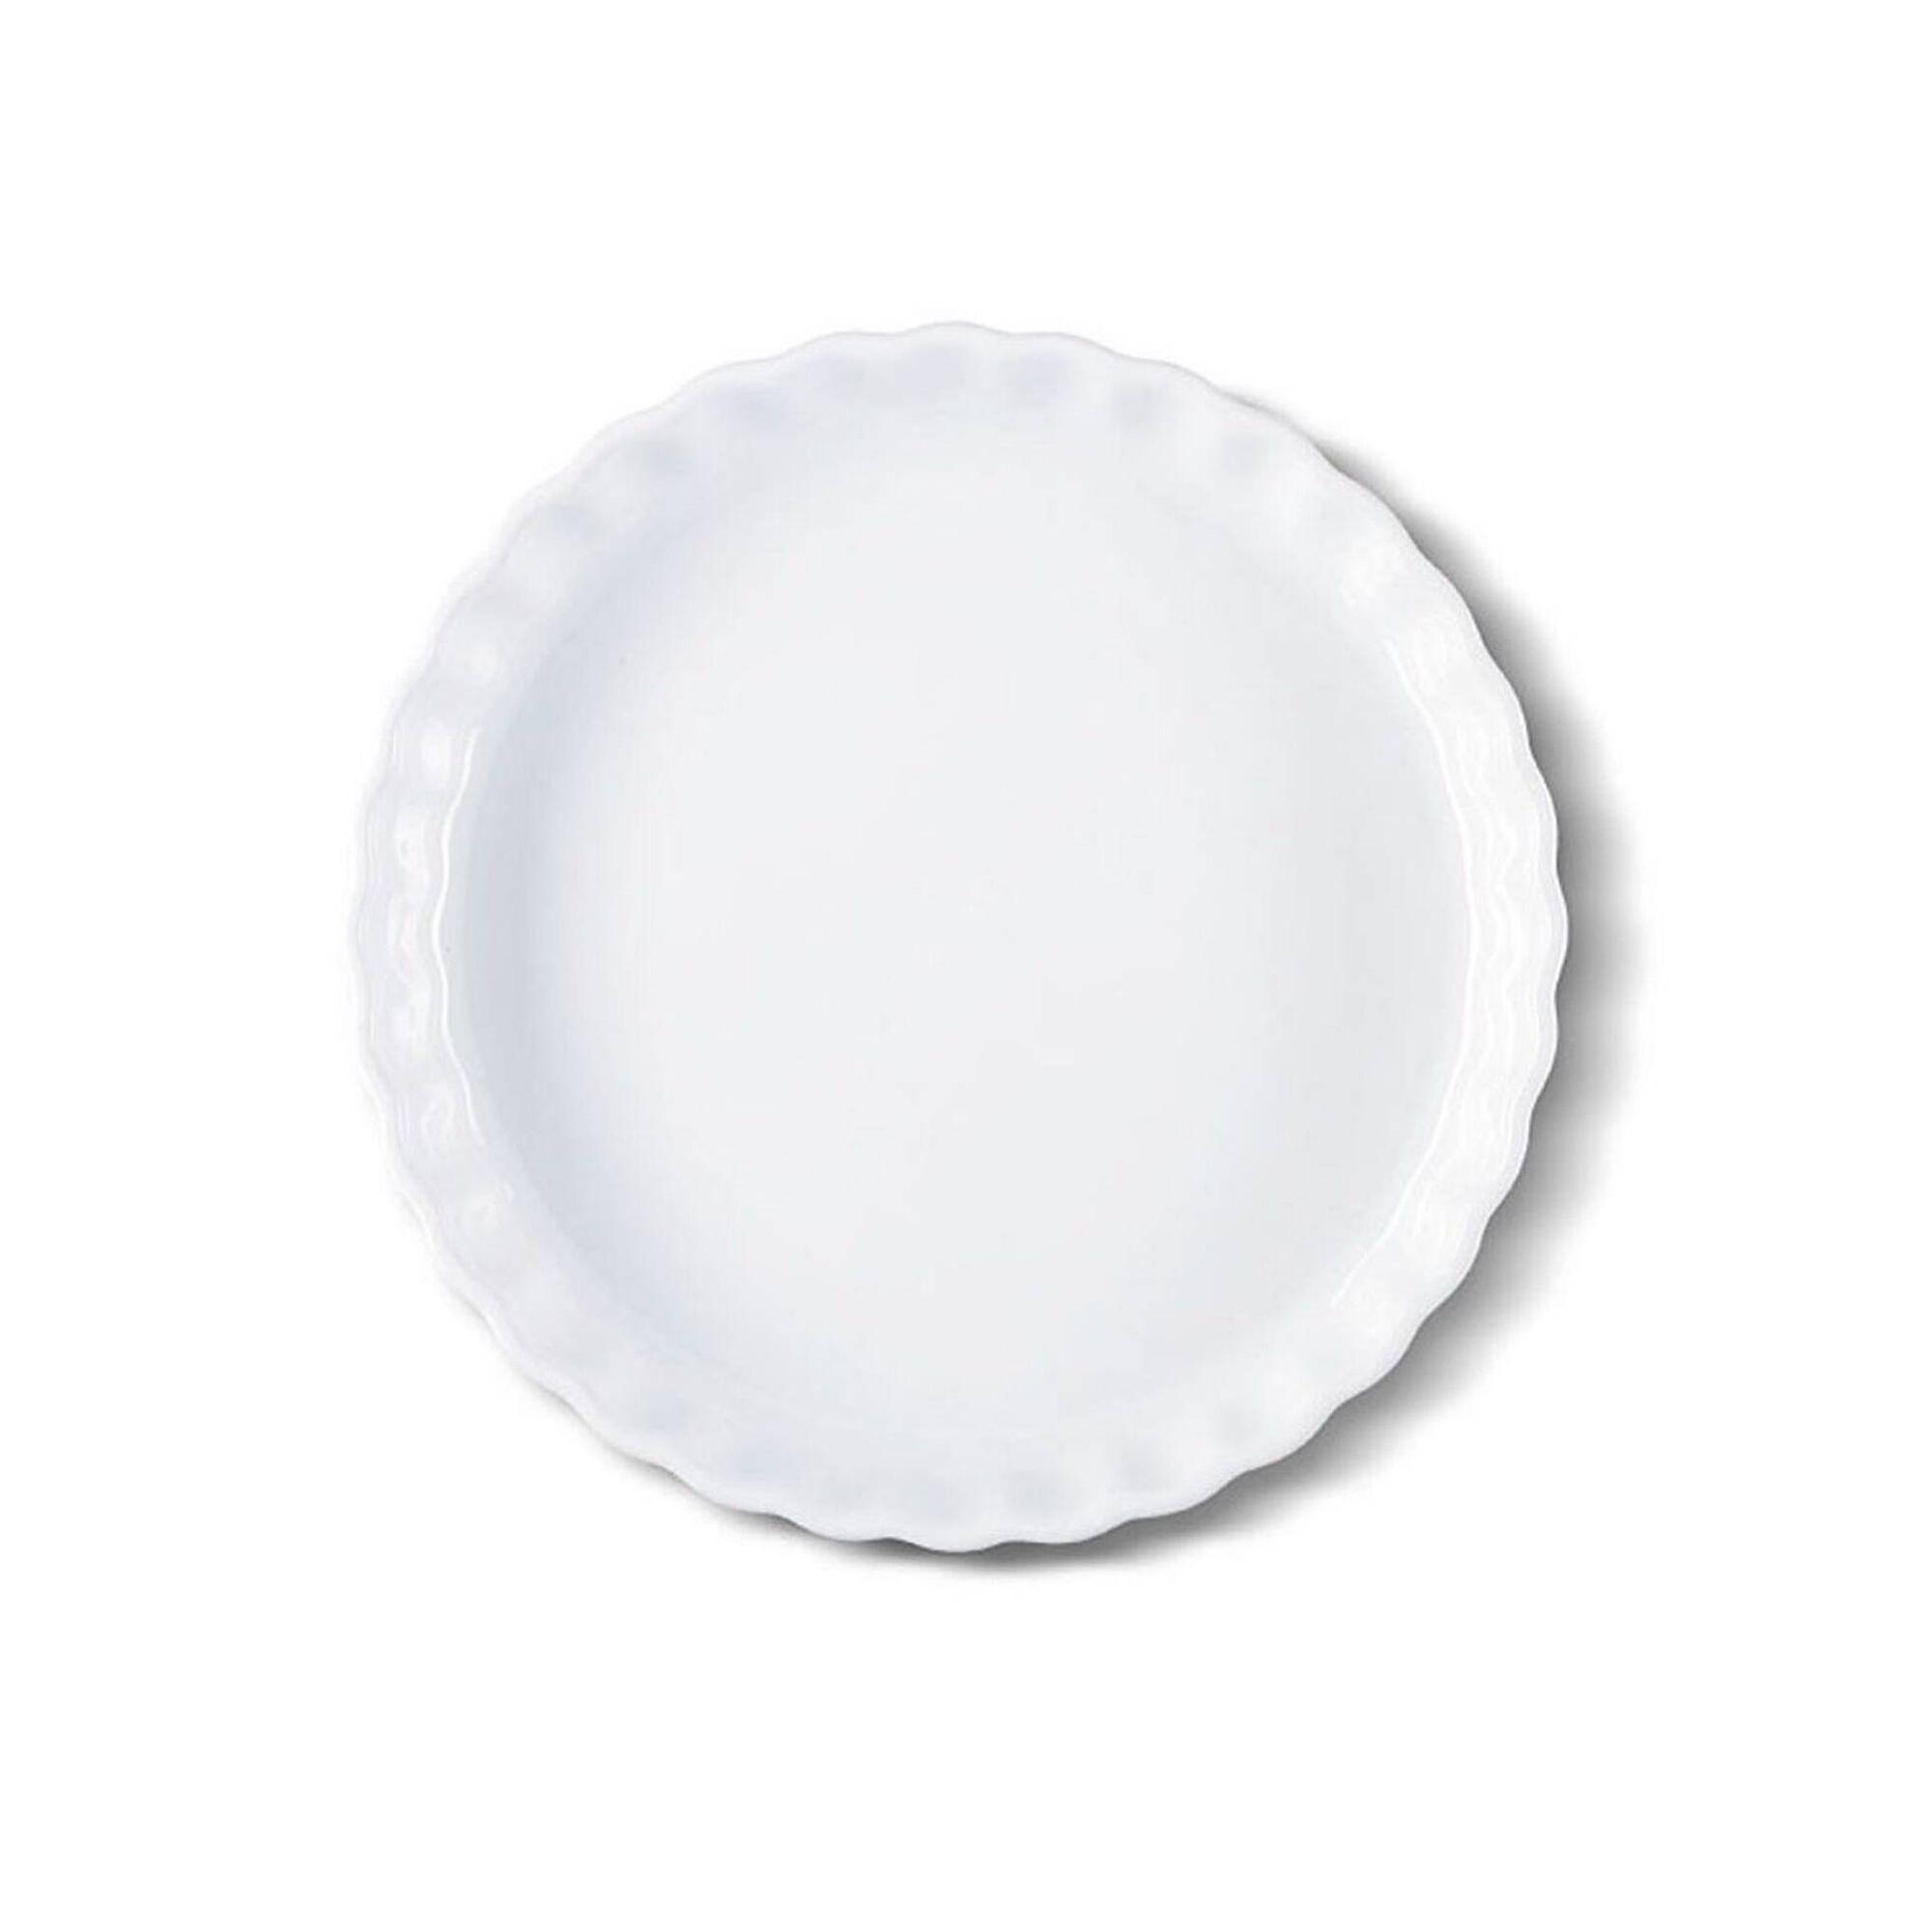 Tarteira Grés 26cm Branca Oven